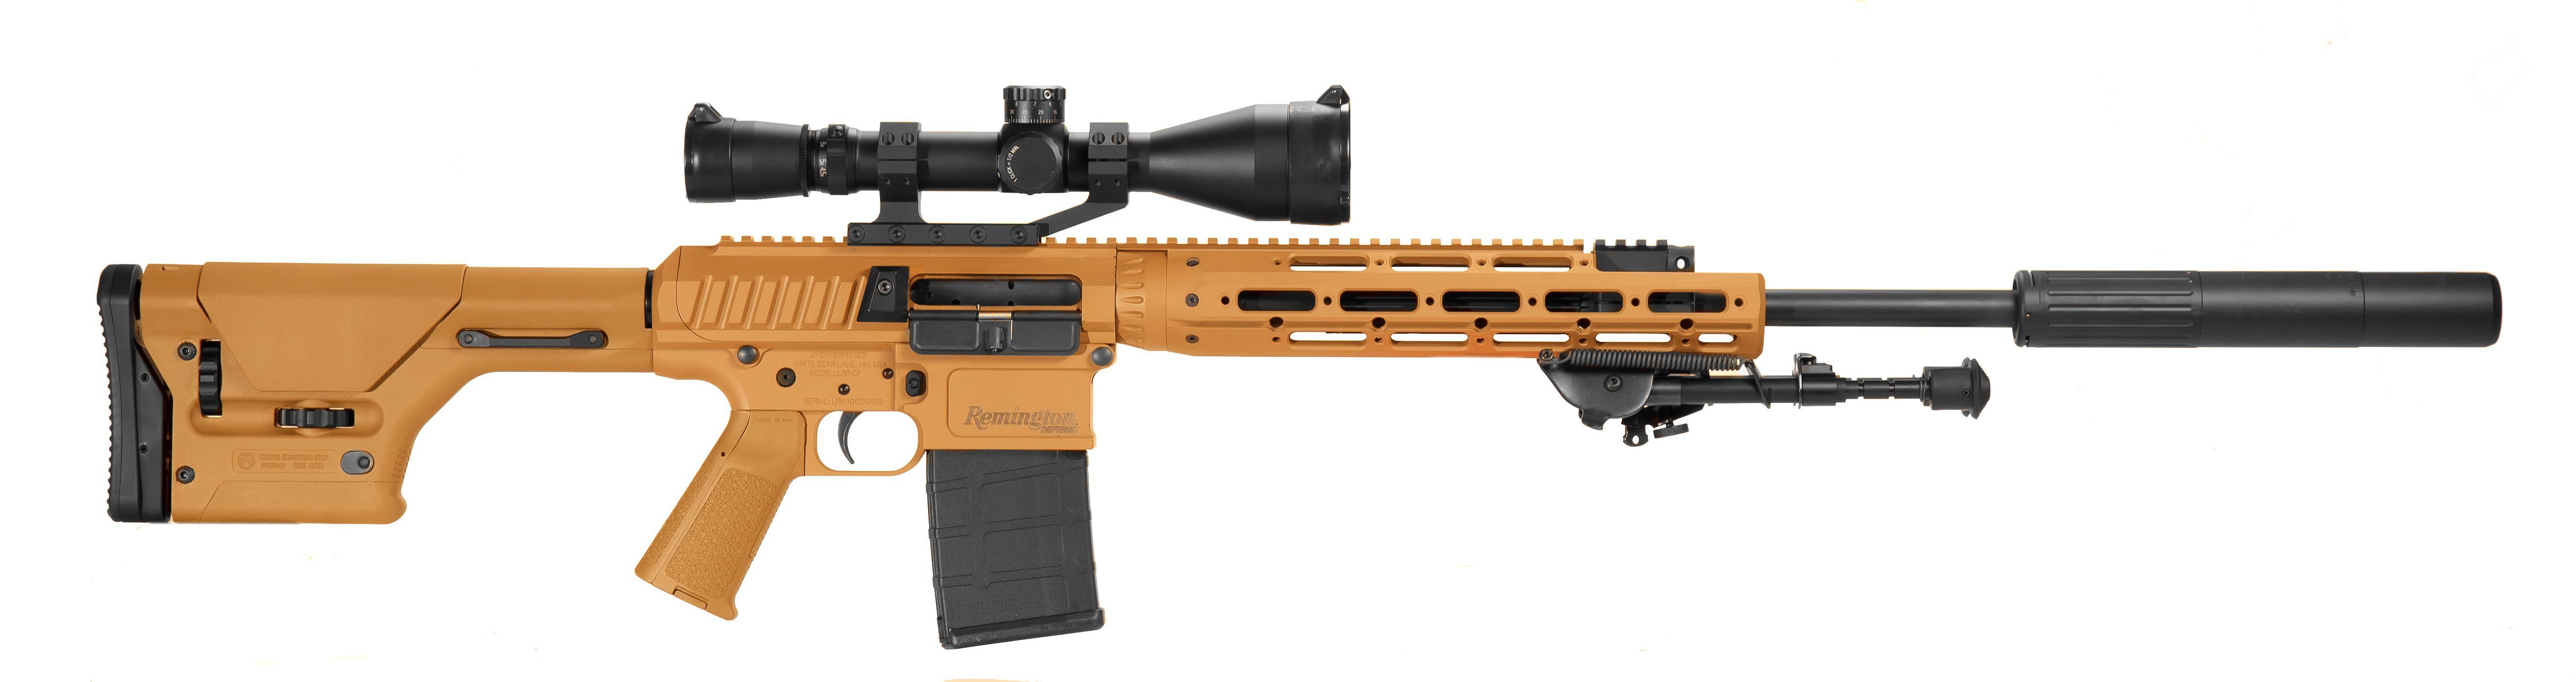 Remington Semi Automatic Sniper System | Infantry